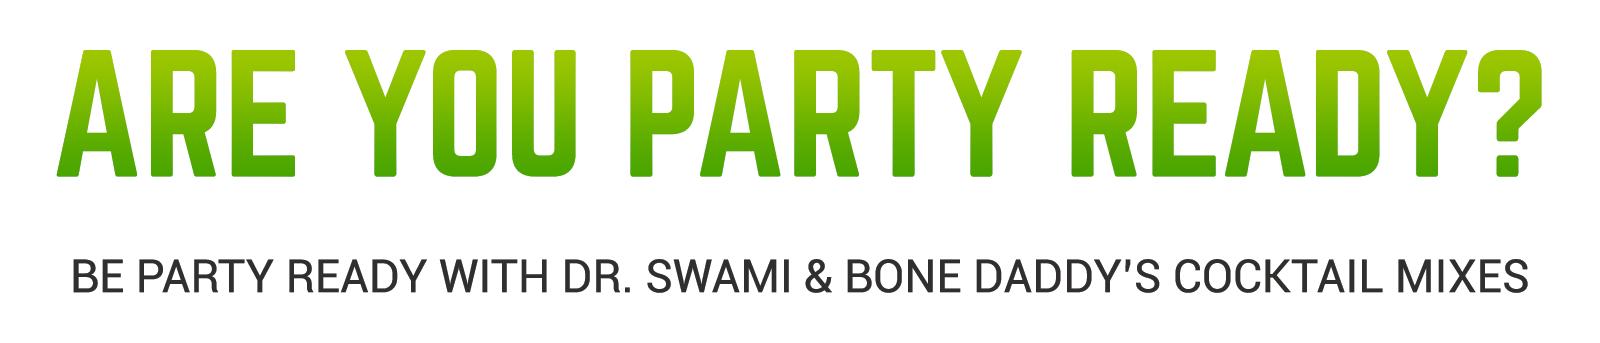 PartyReady_Headline